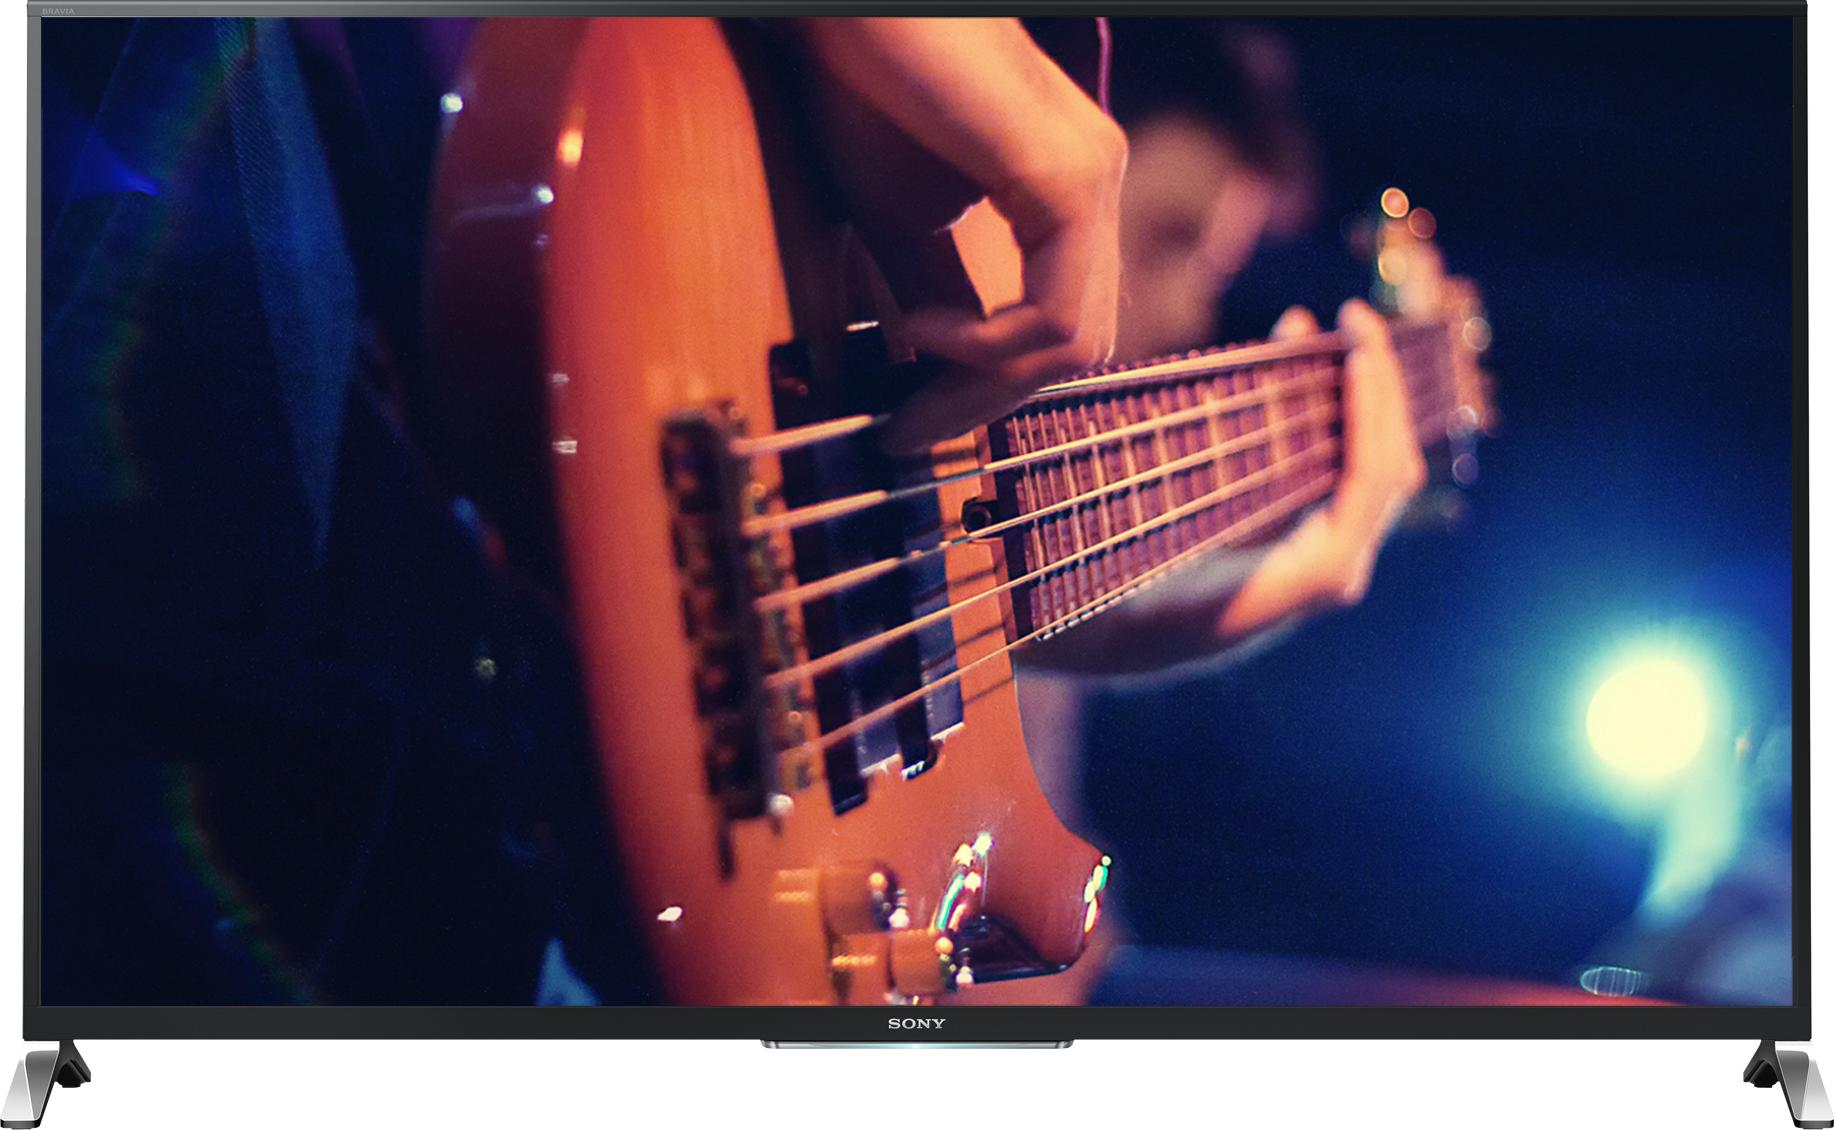 Sony W950B Ultimate LED HDTV